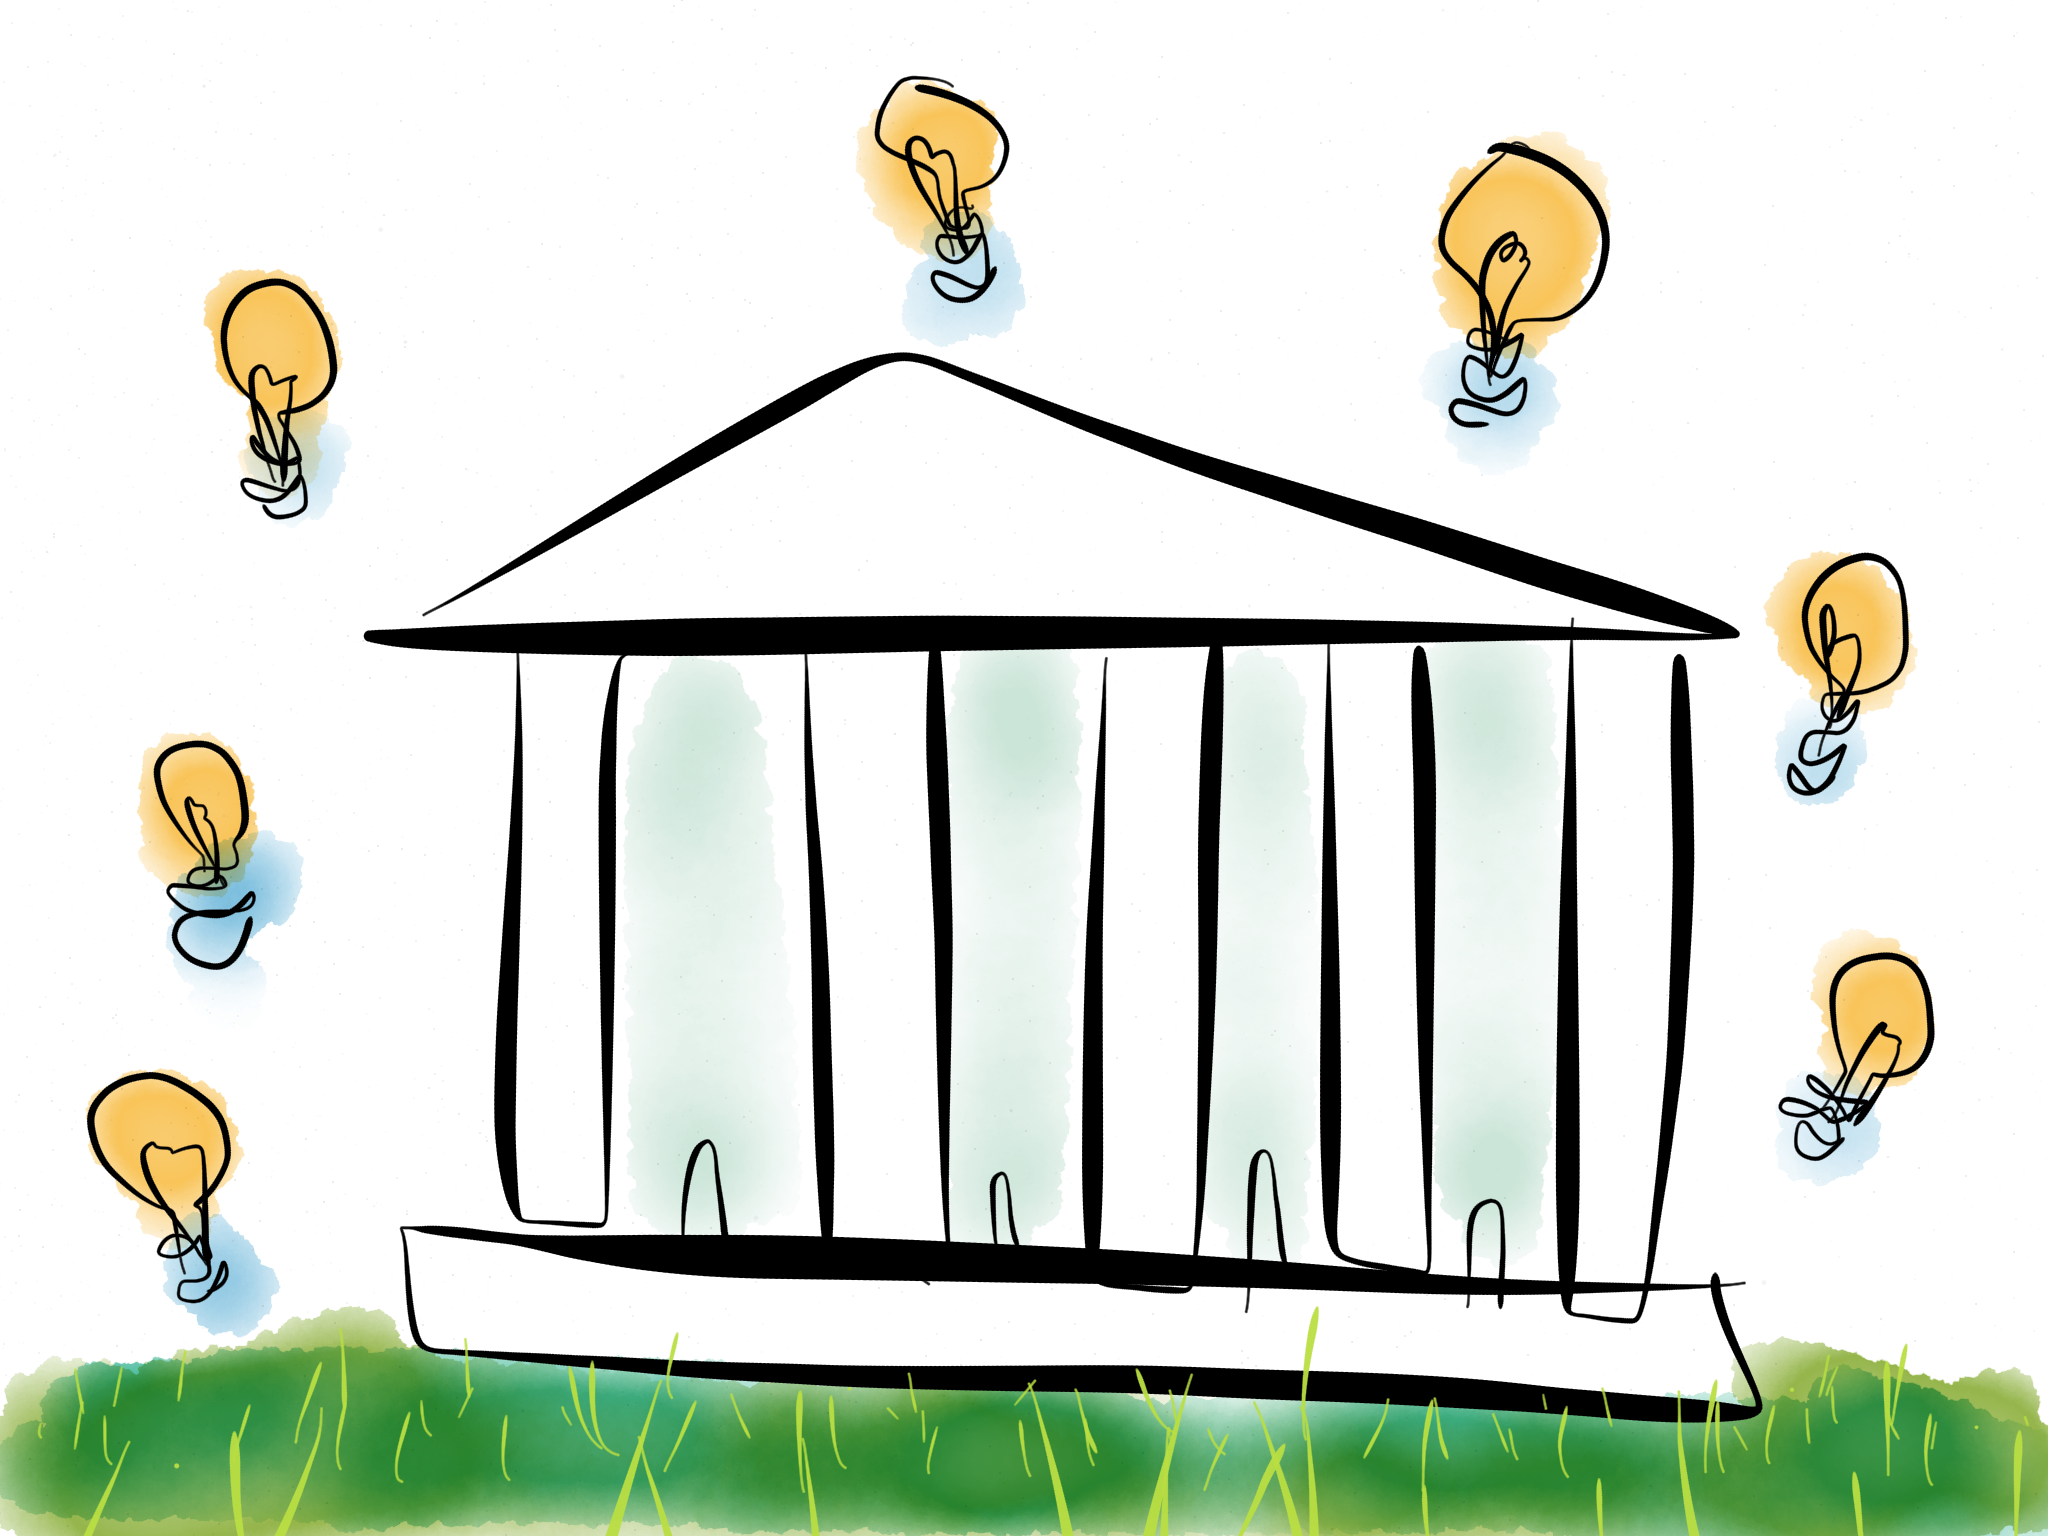 Law schools as innovation incubators